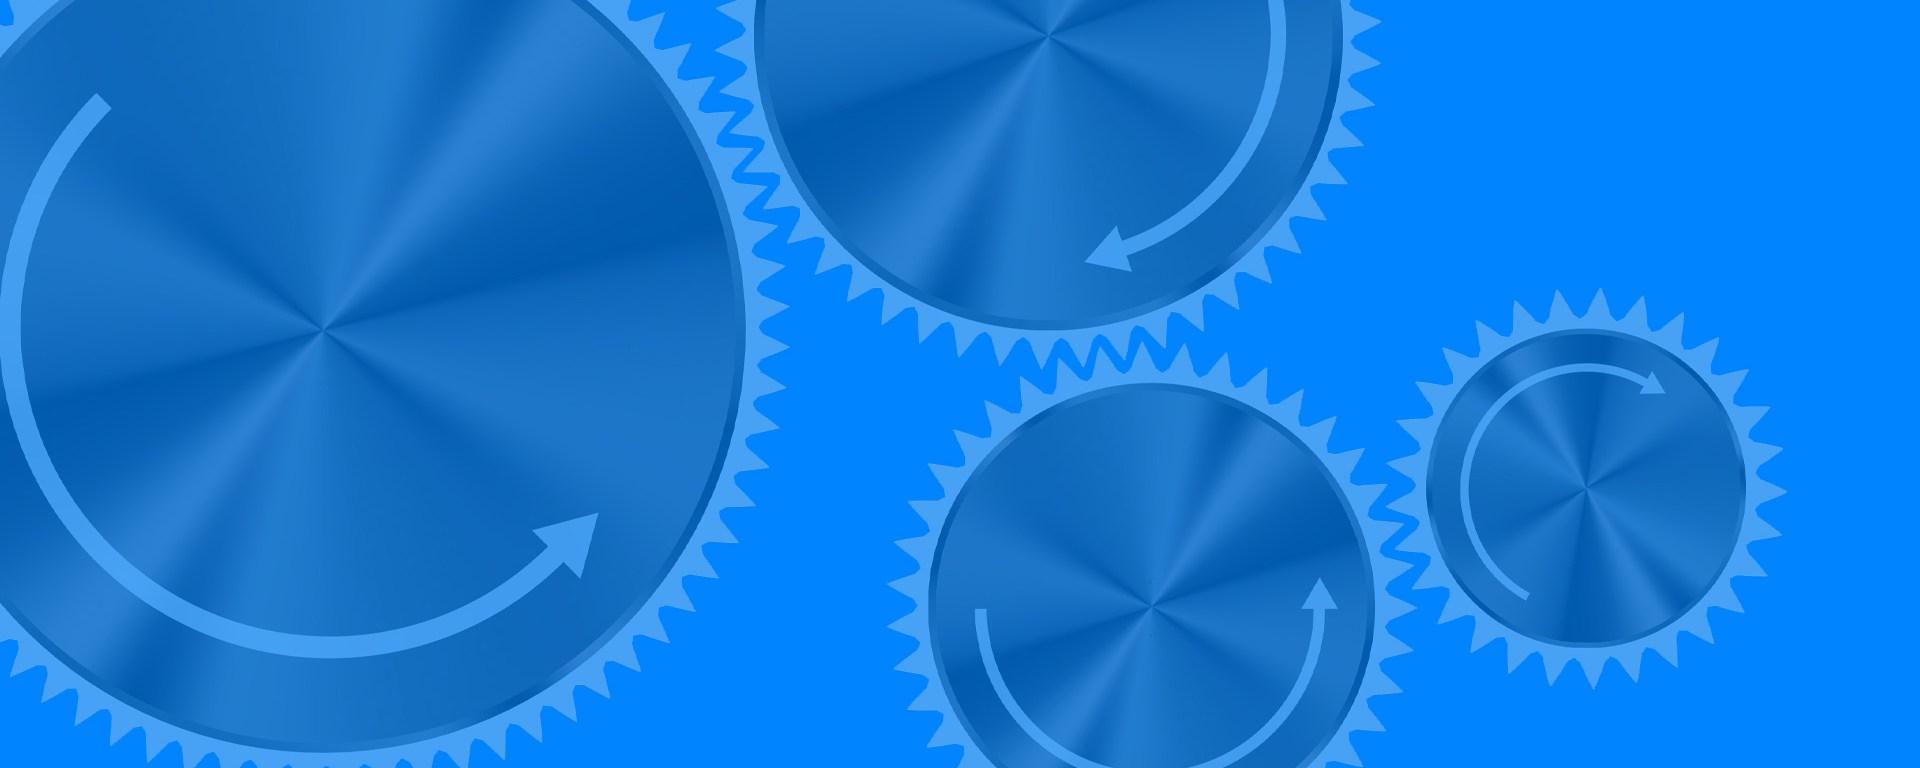 HFPG Gears_2.1.16(1)